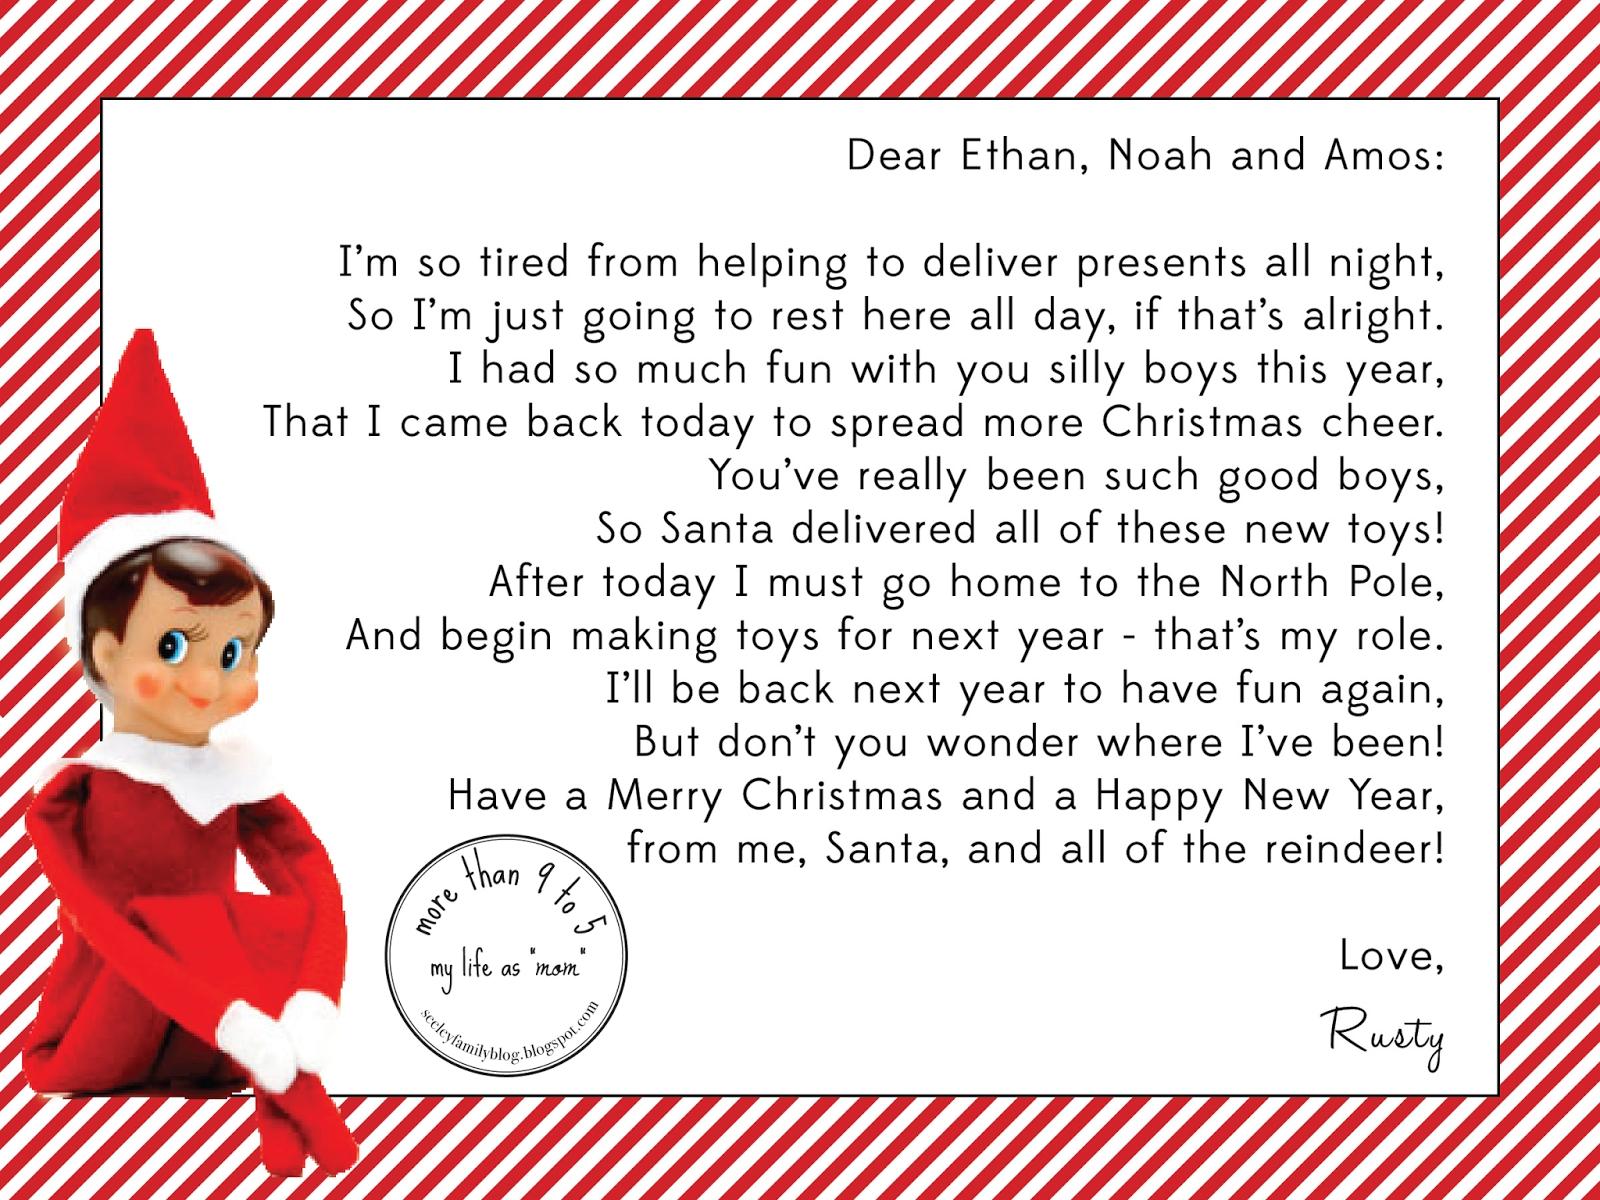 10 Stunning Letter From Elf On The Shelf Idea free printable elf on the shelf letter template example letterhead 2020